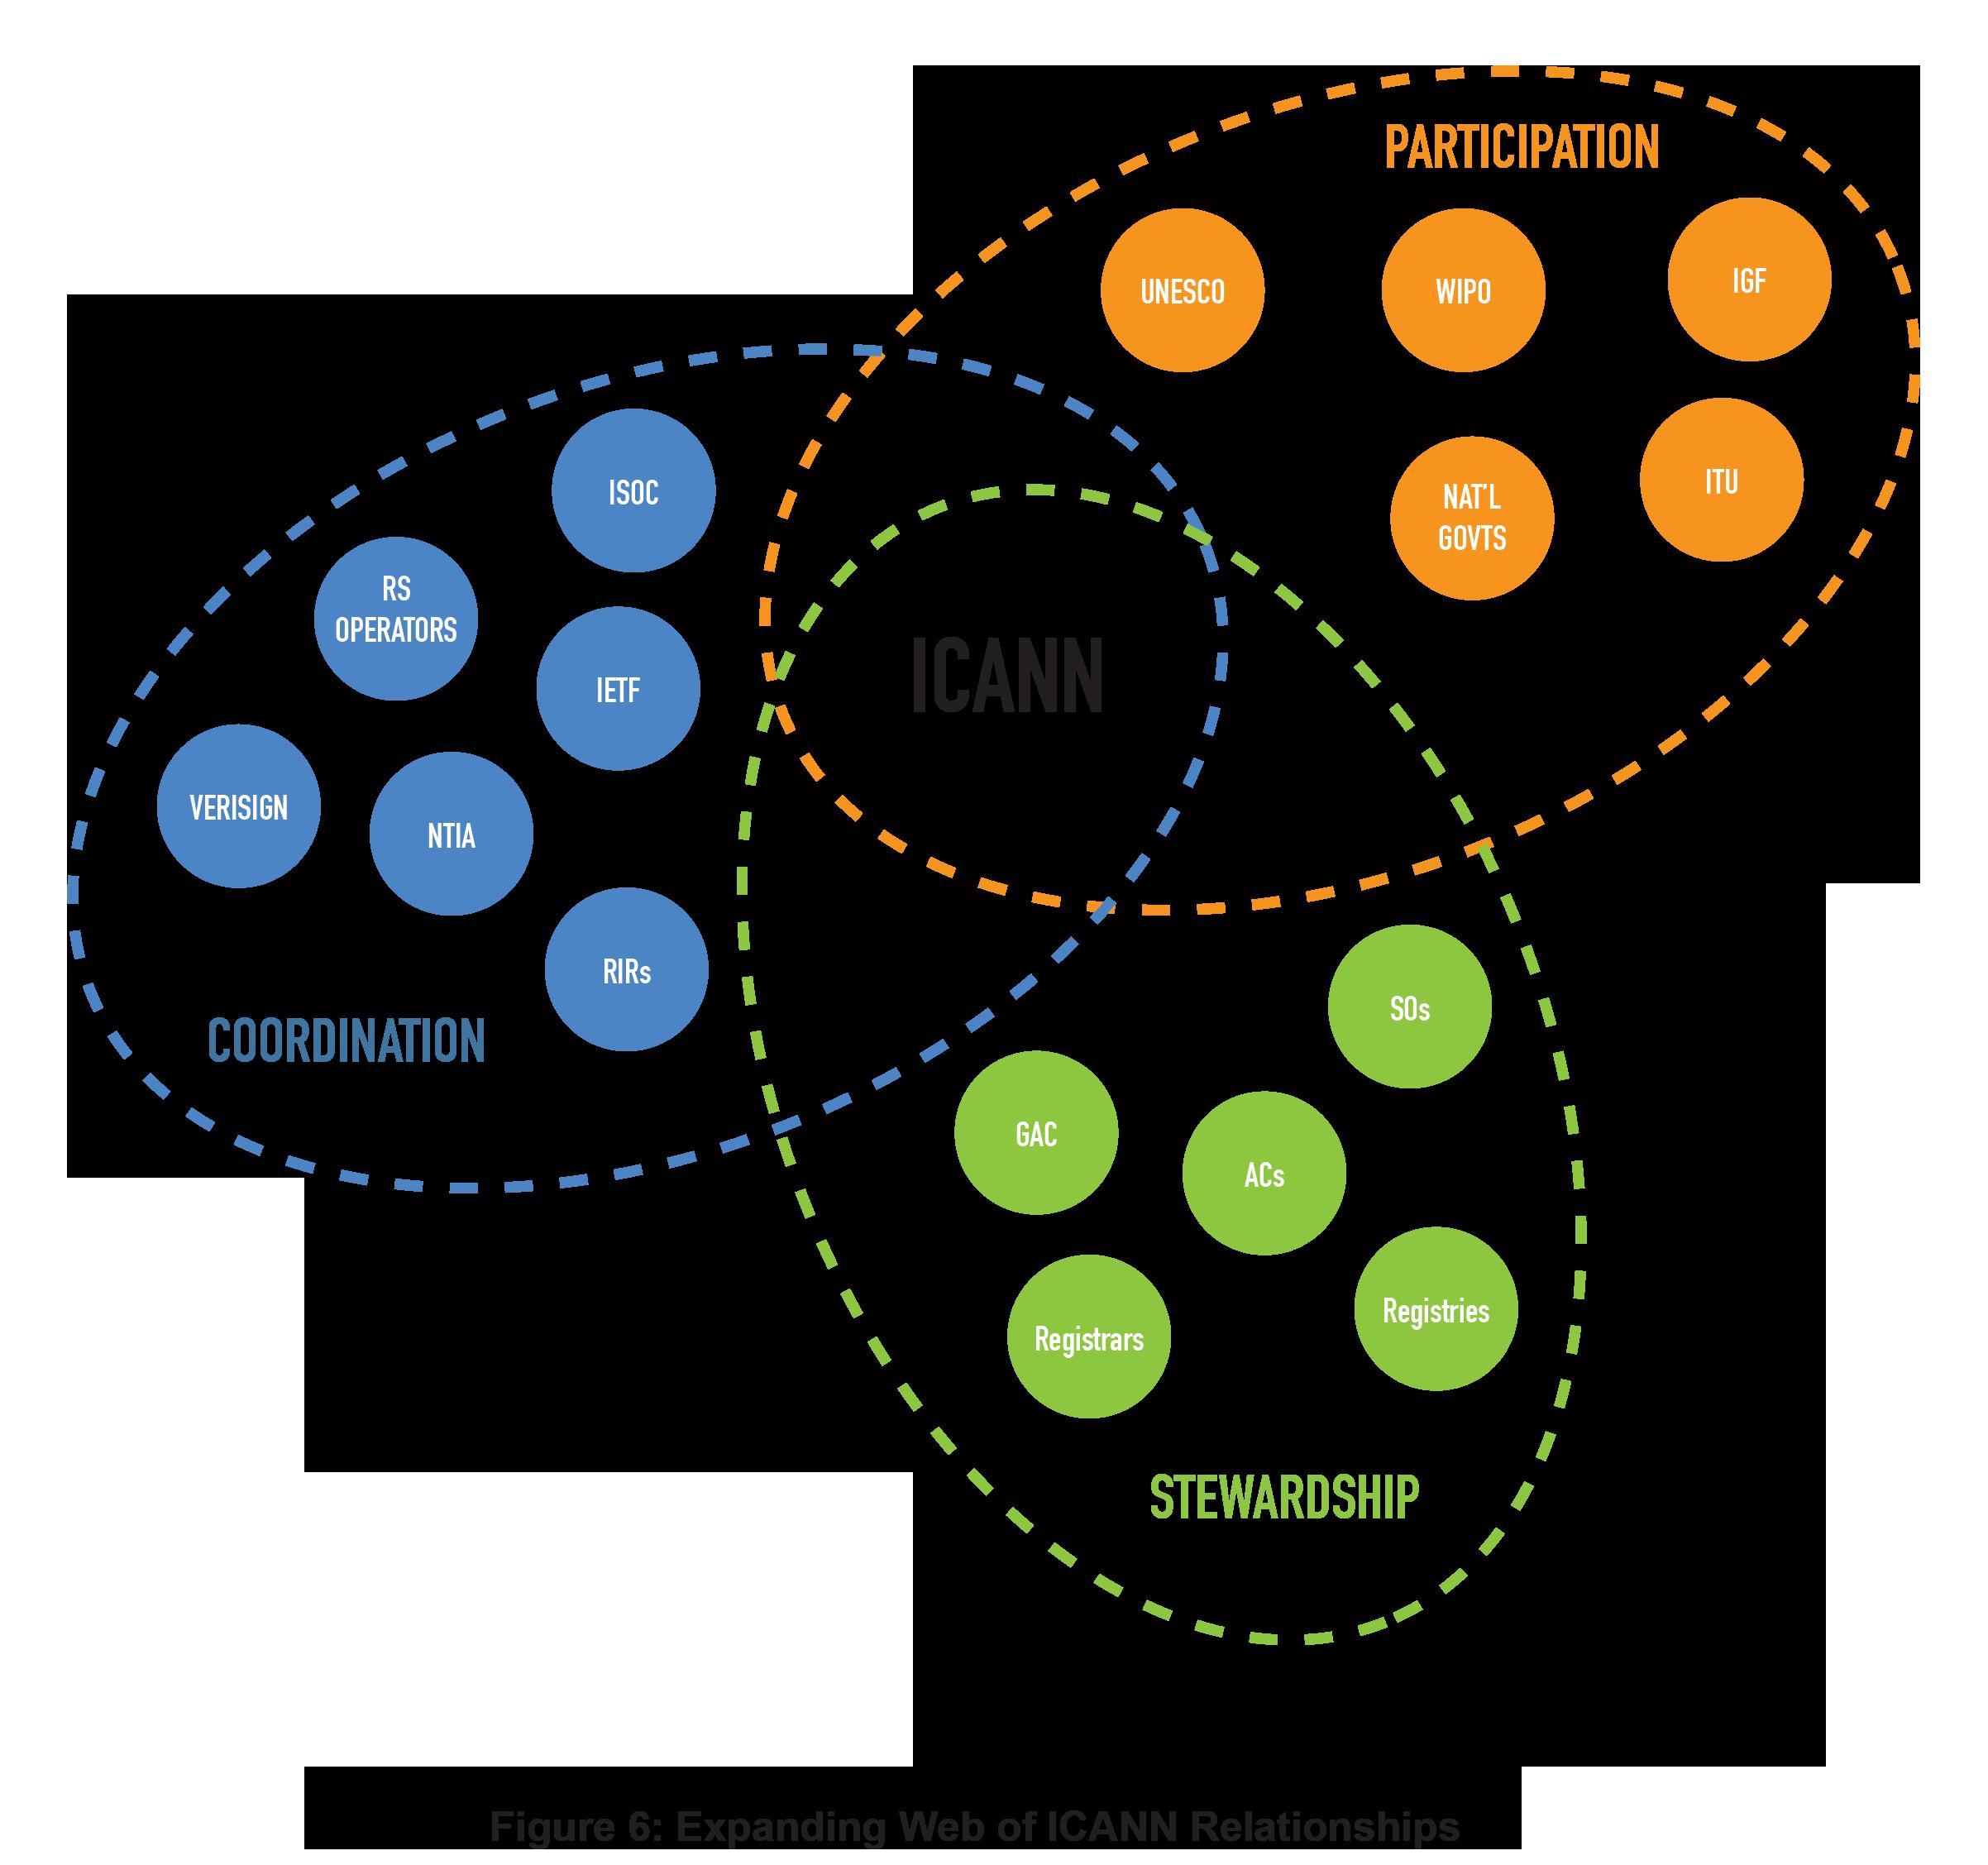 Figure 6: Expanding Web of ICANN Relationships